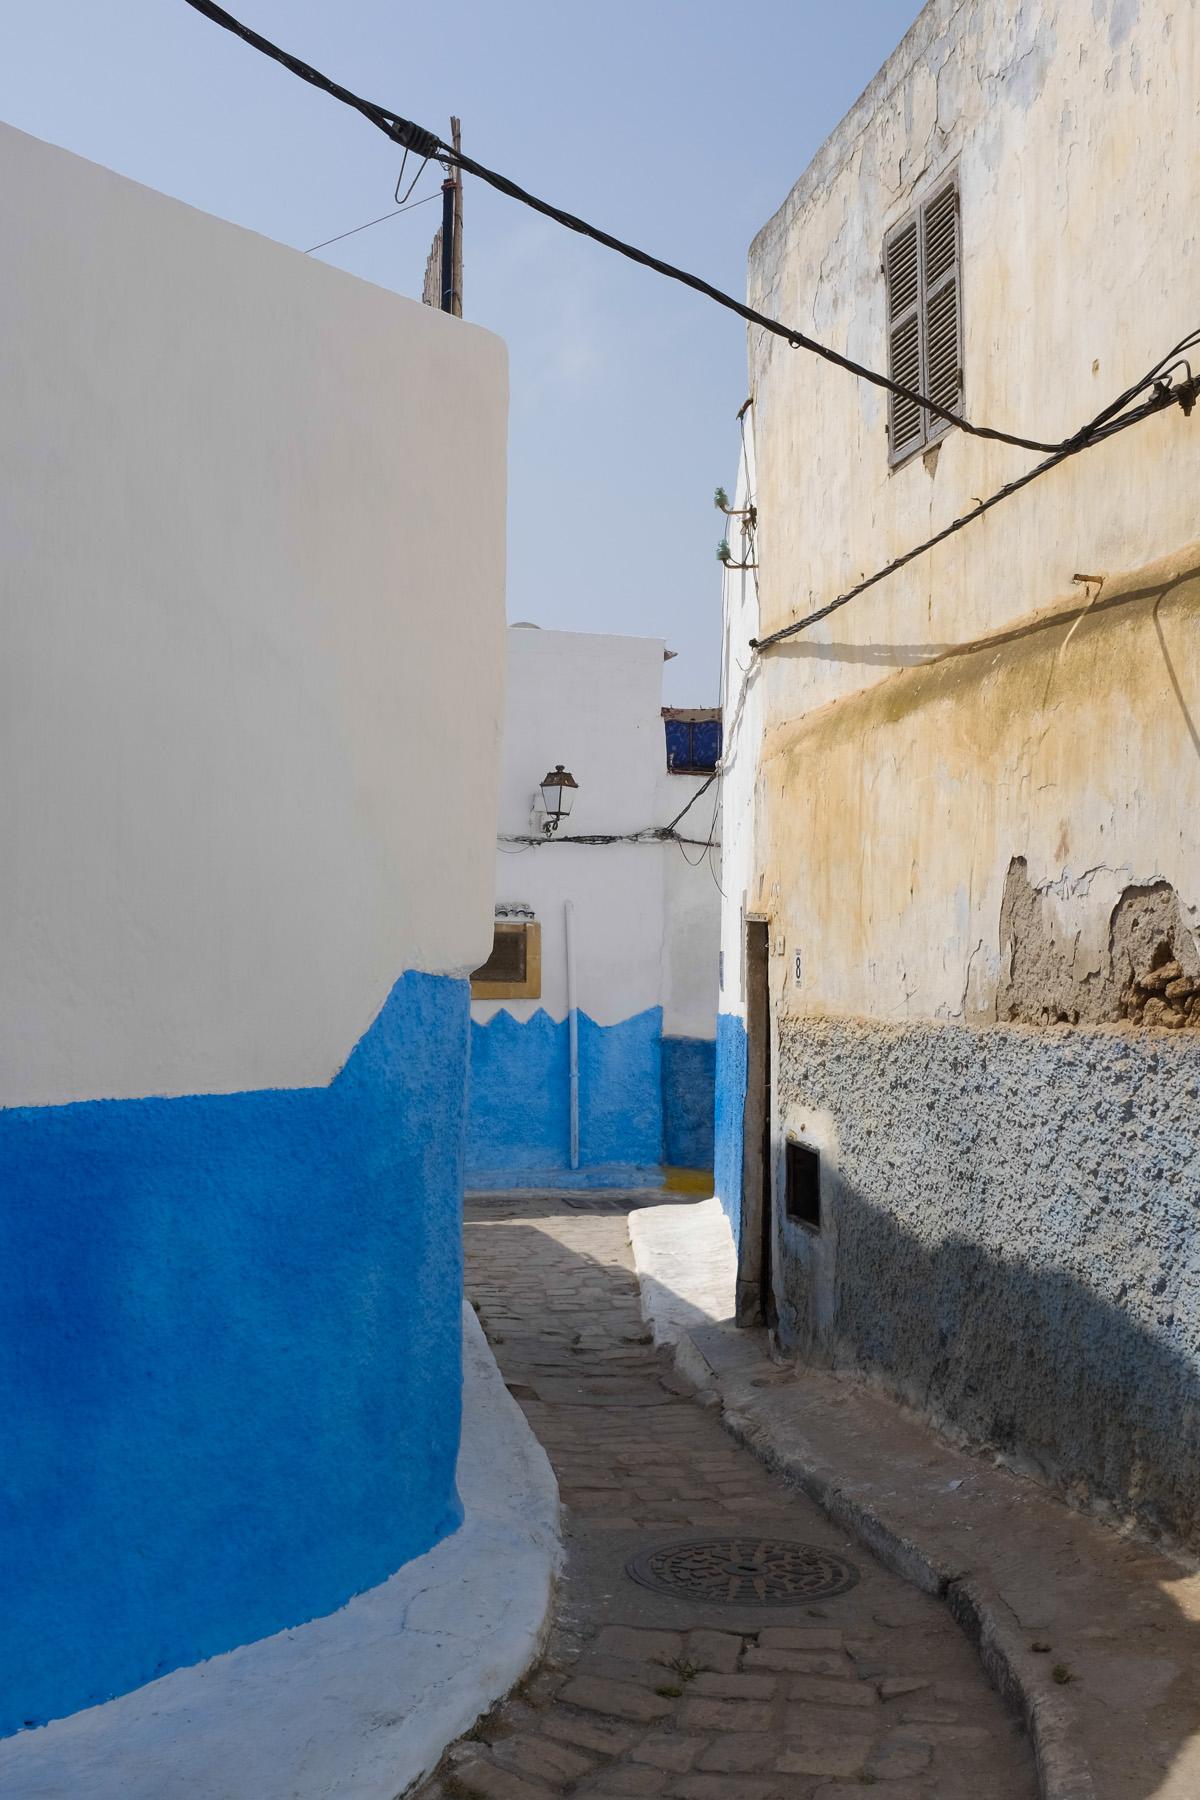 201307 Rabat 018.jpg